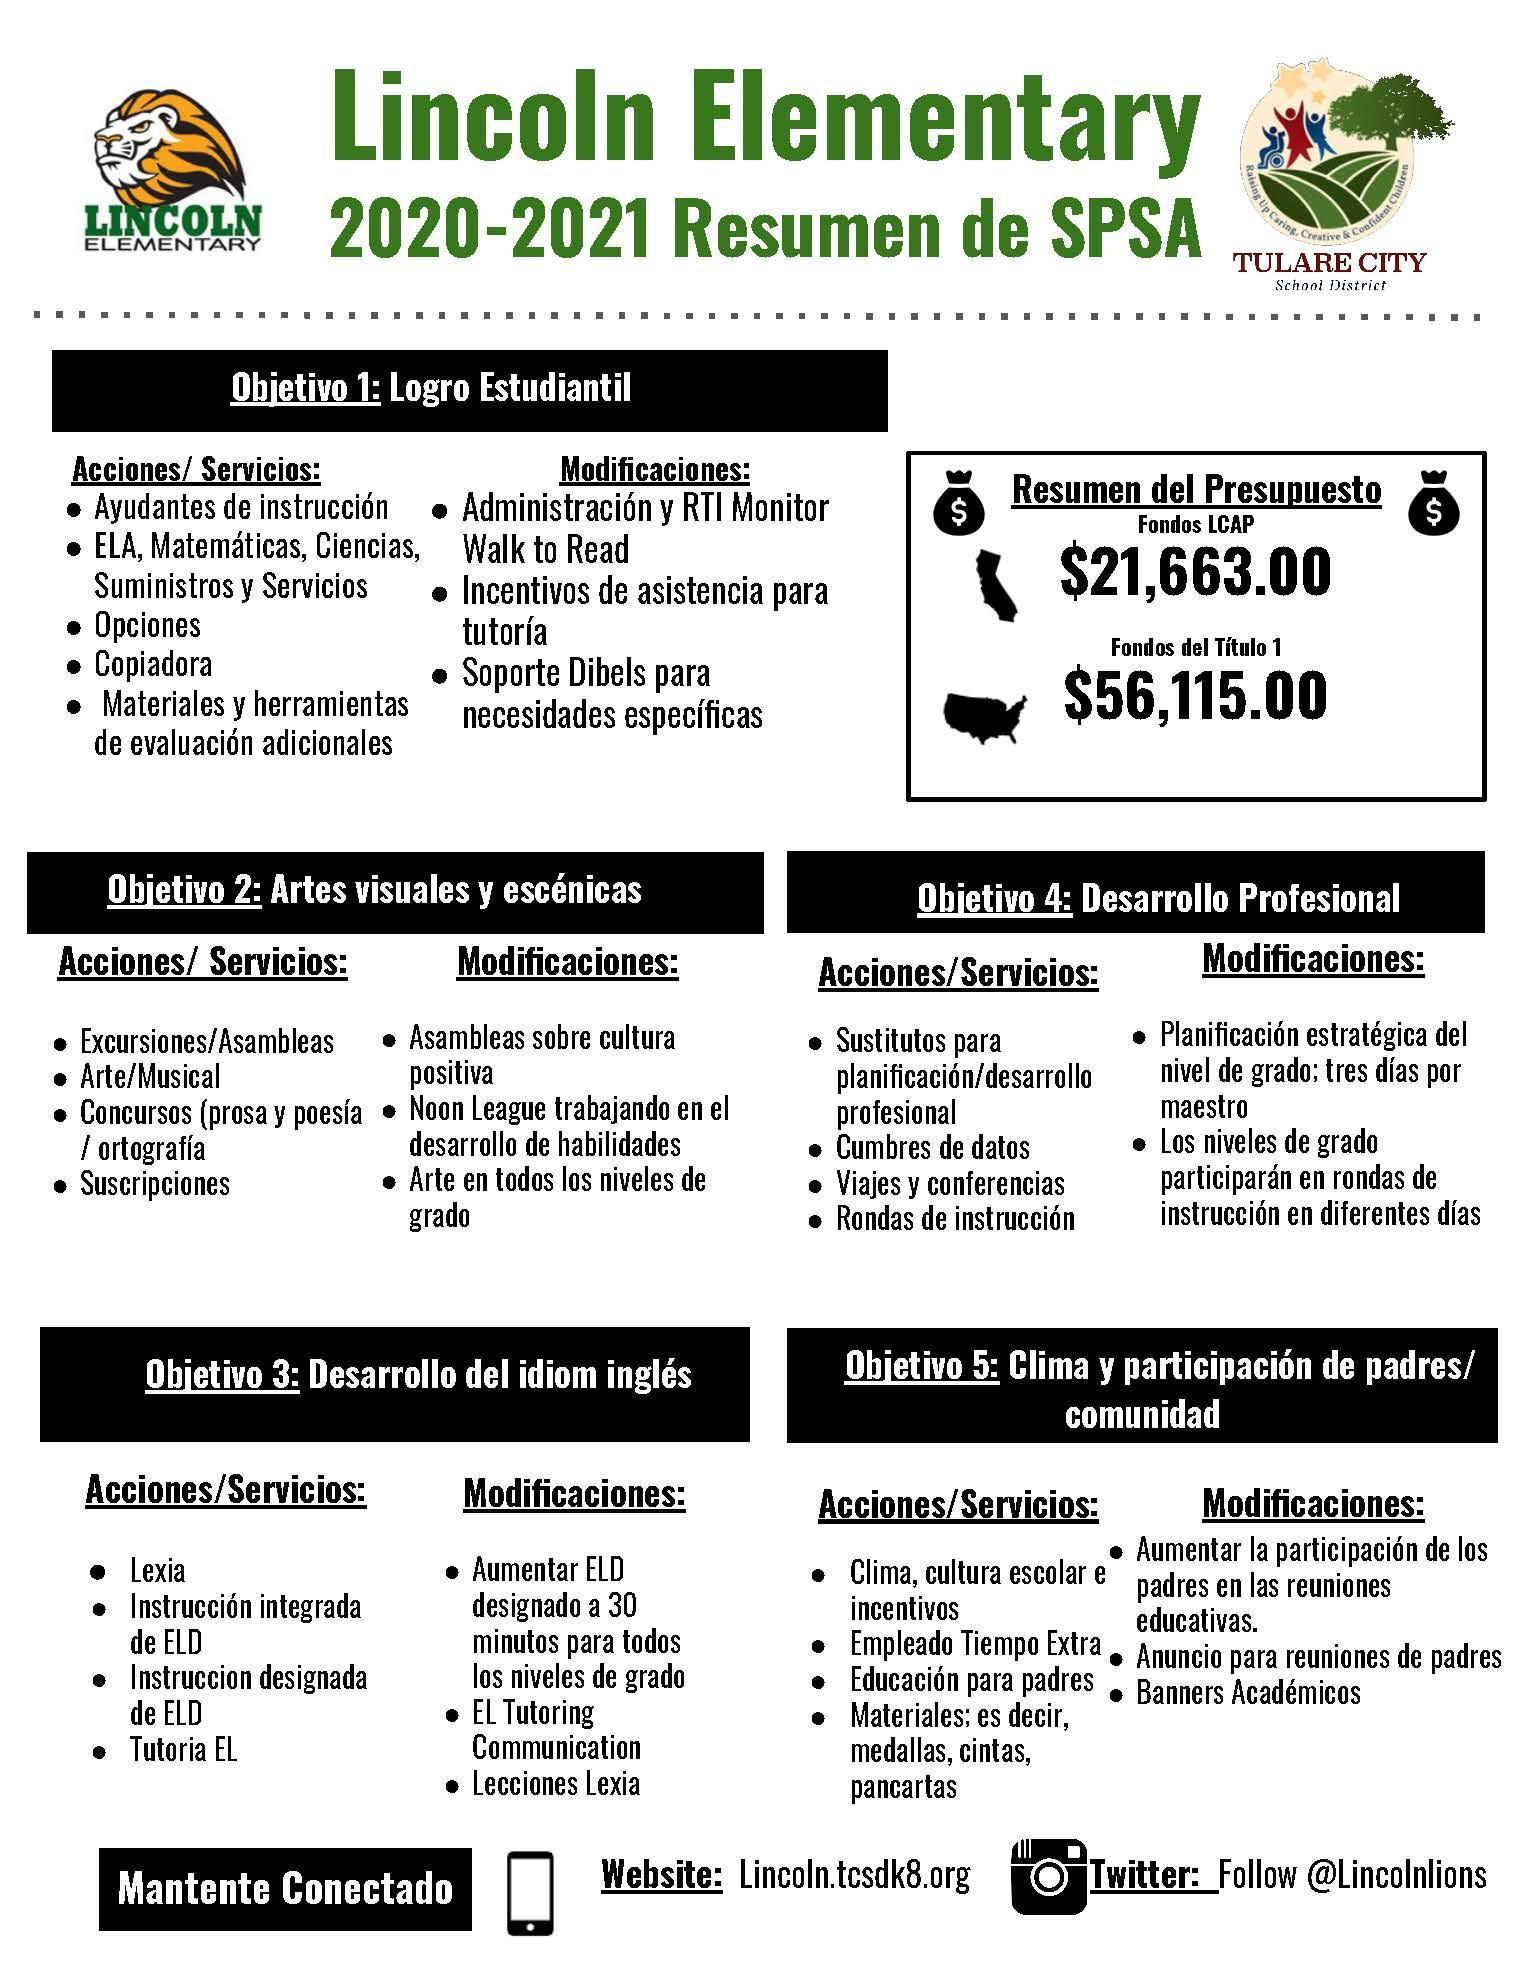 SPSA 20/21 Spanish